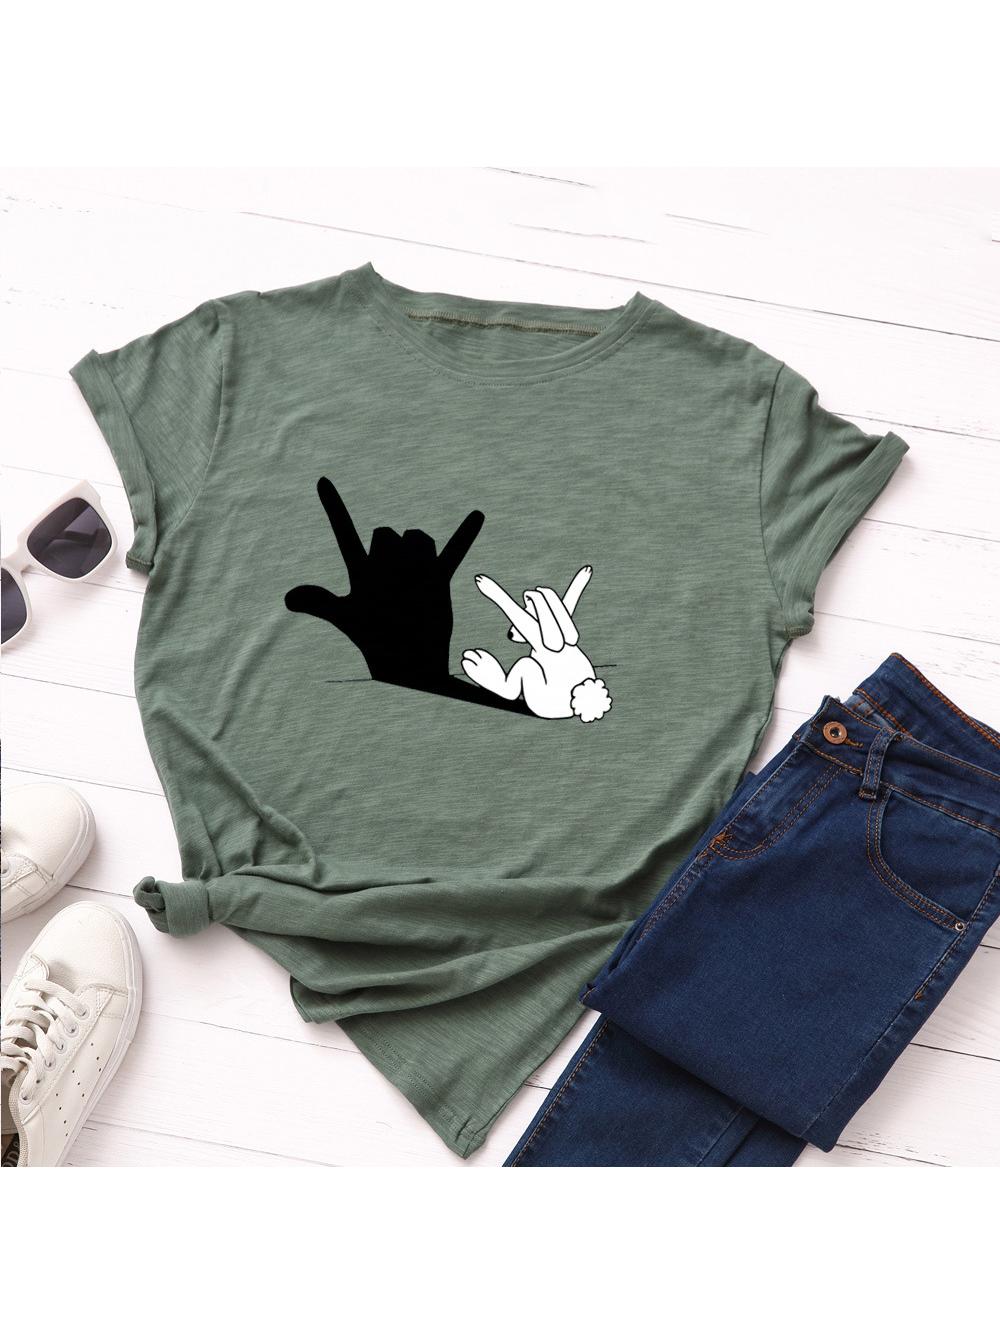 Casual Cute Printed Short Sleeve T-shirt